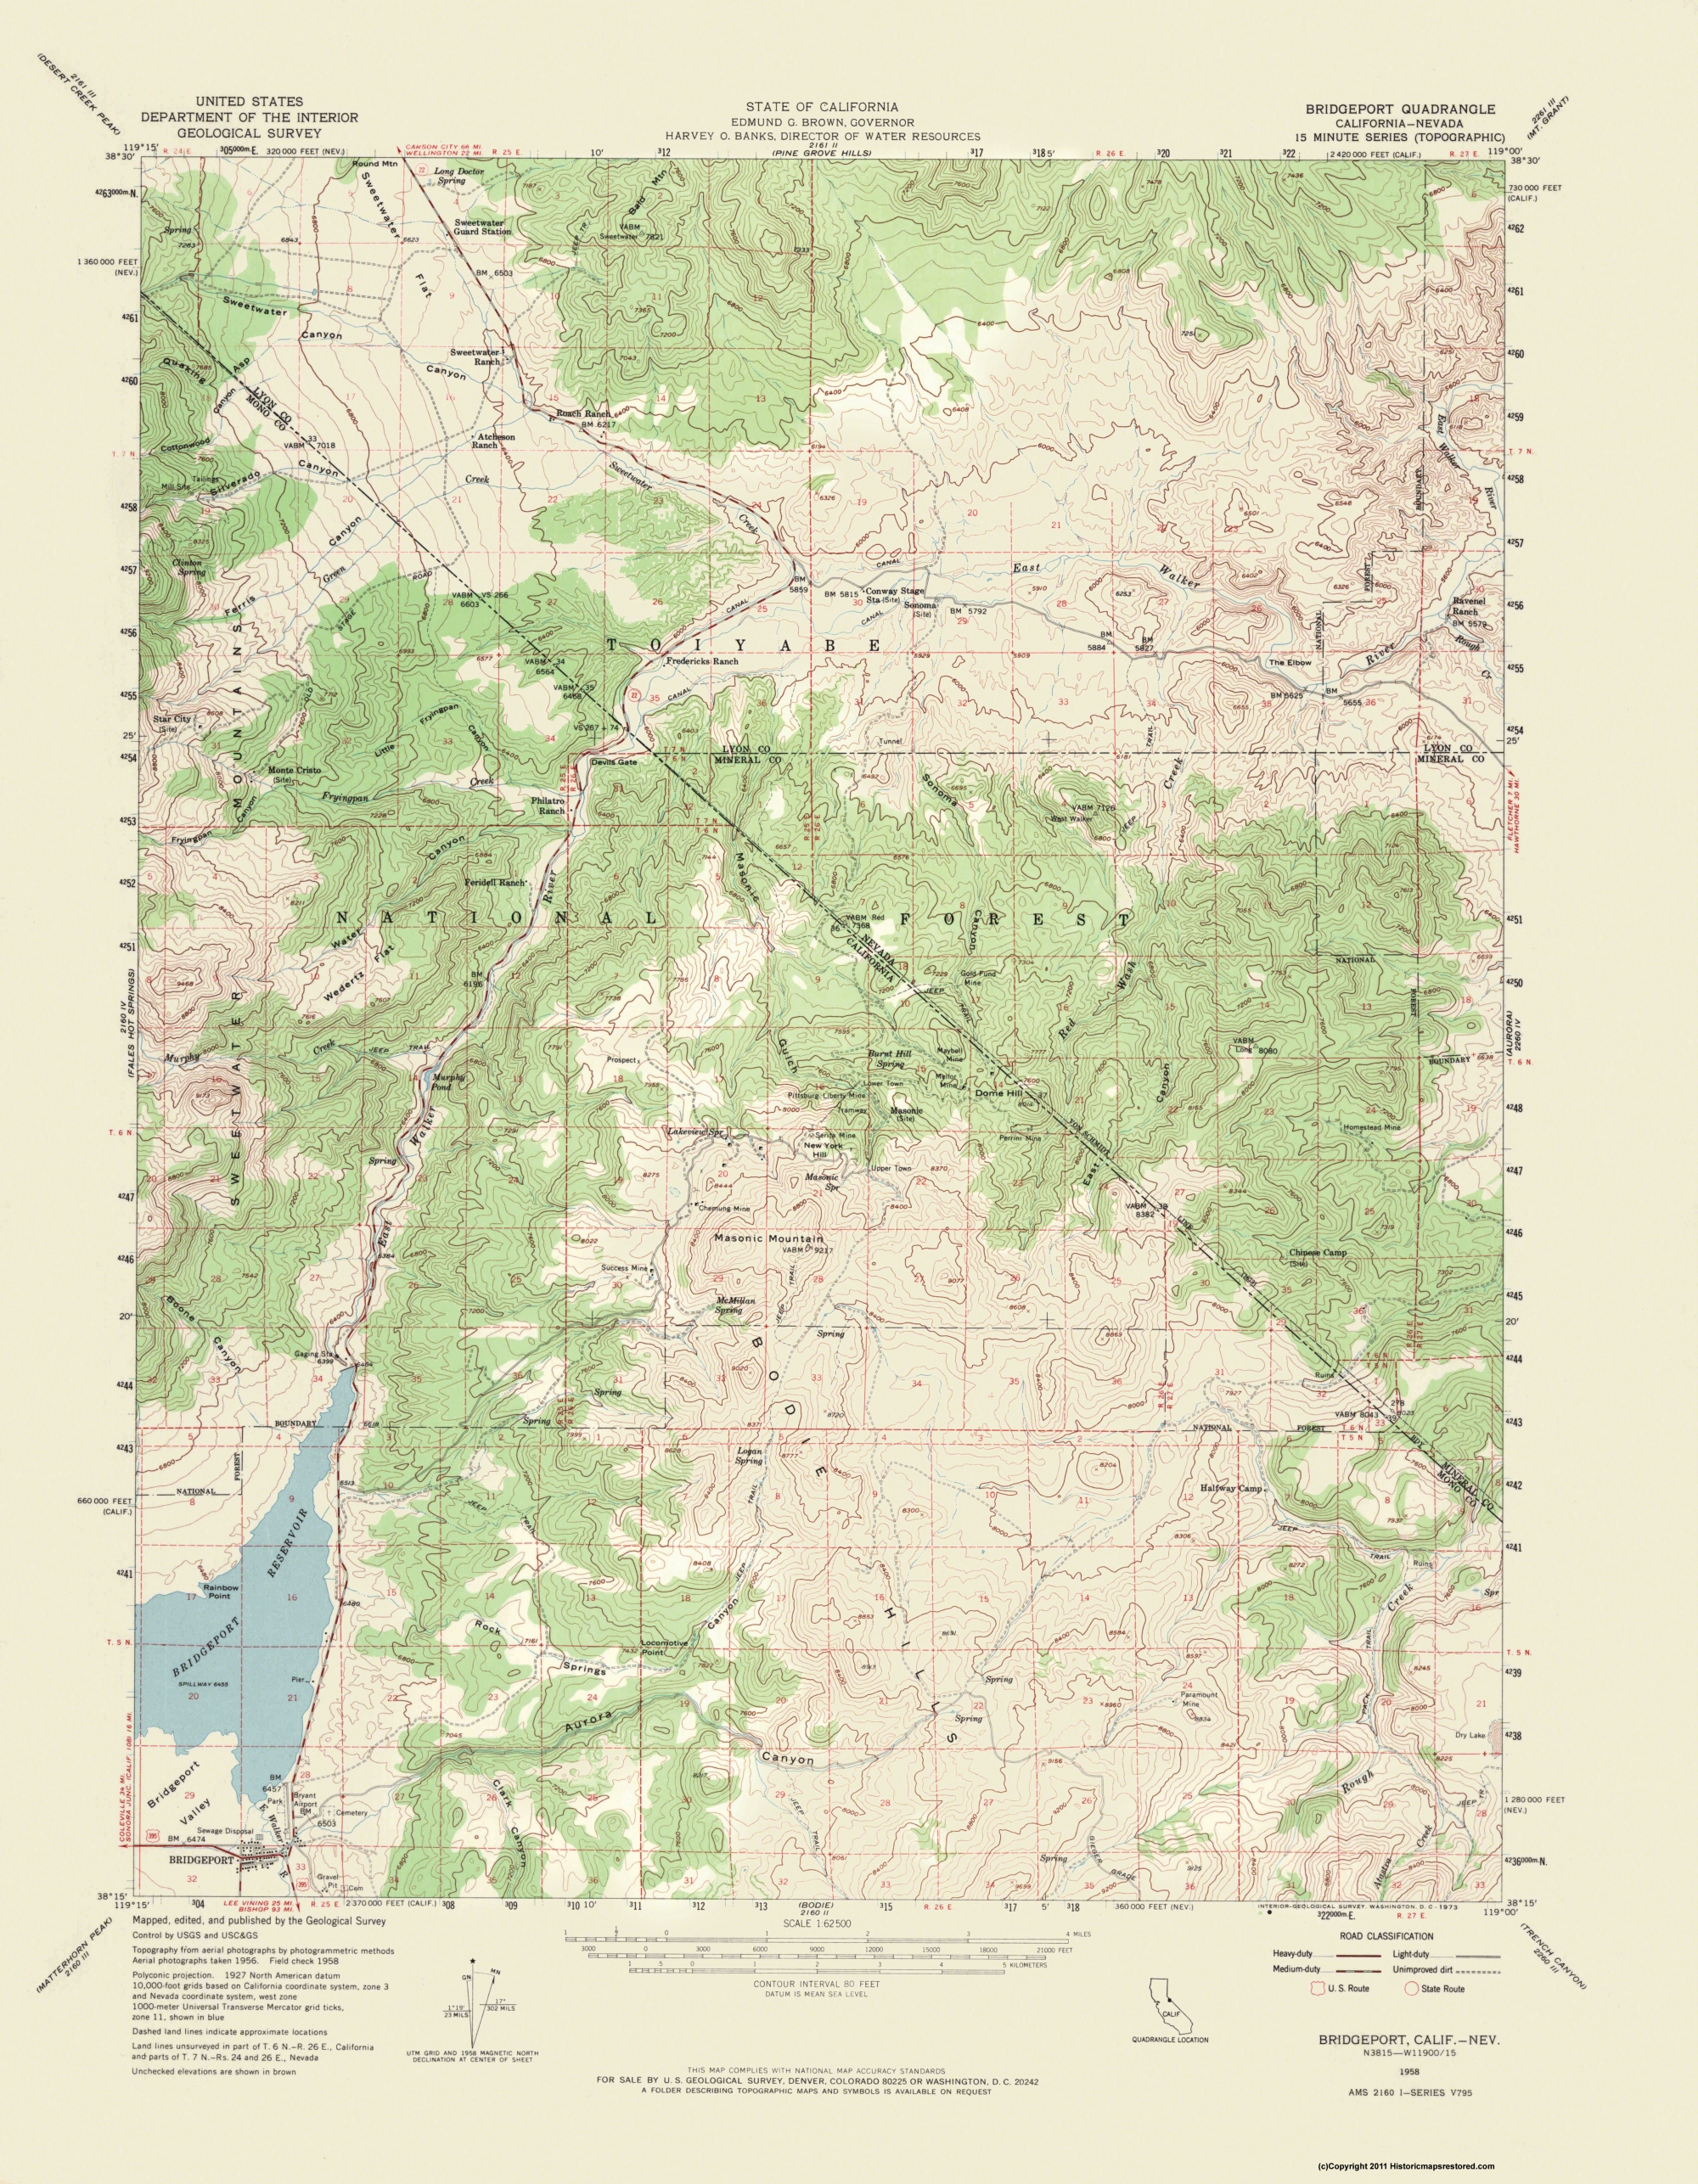 Old Topographical Map Bridgeport Nevada 1958